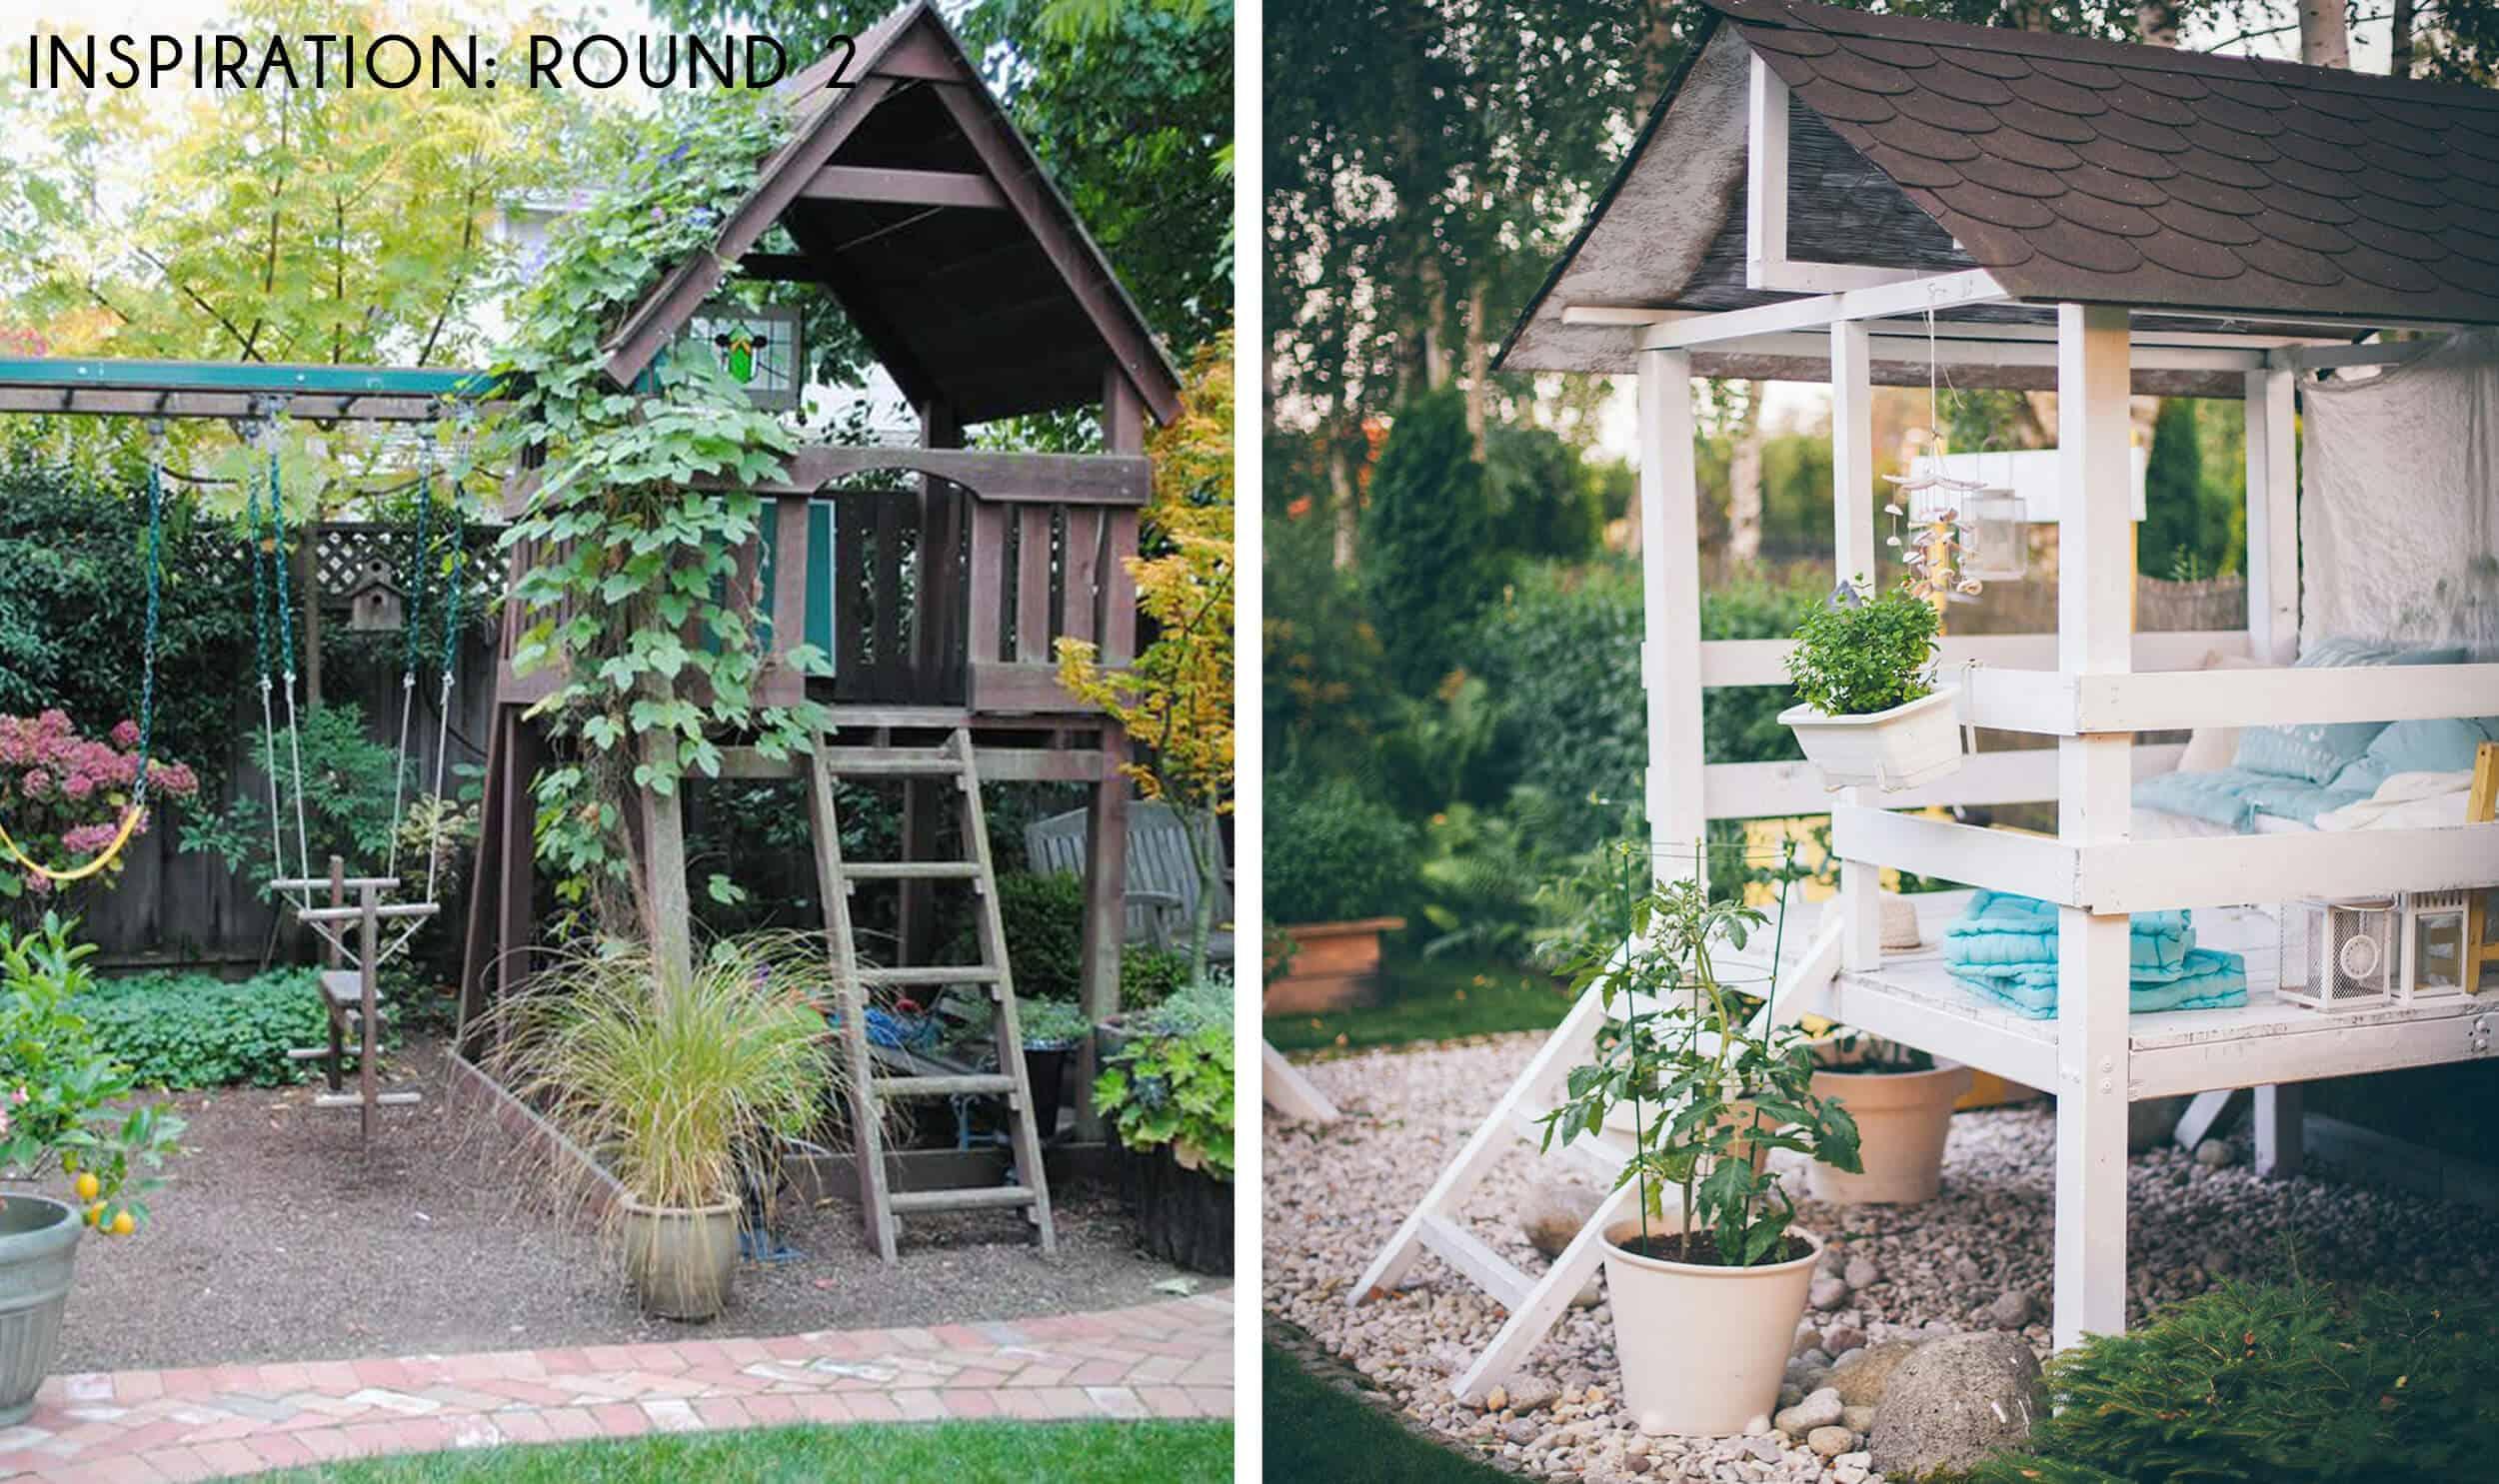 Emily-Henderson_Waverly_Backyard_Playfort_Castle_Inspiration_Round-2